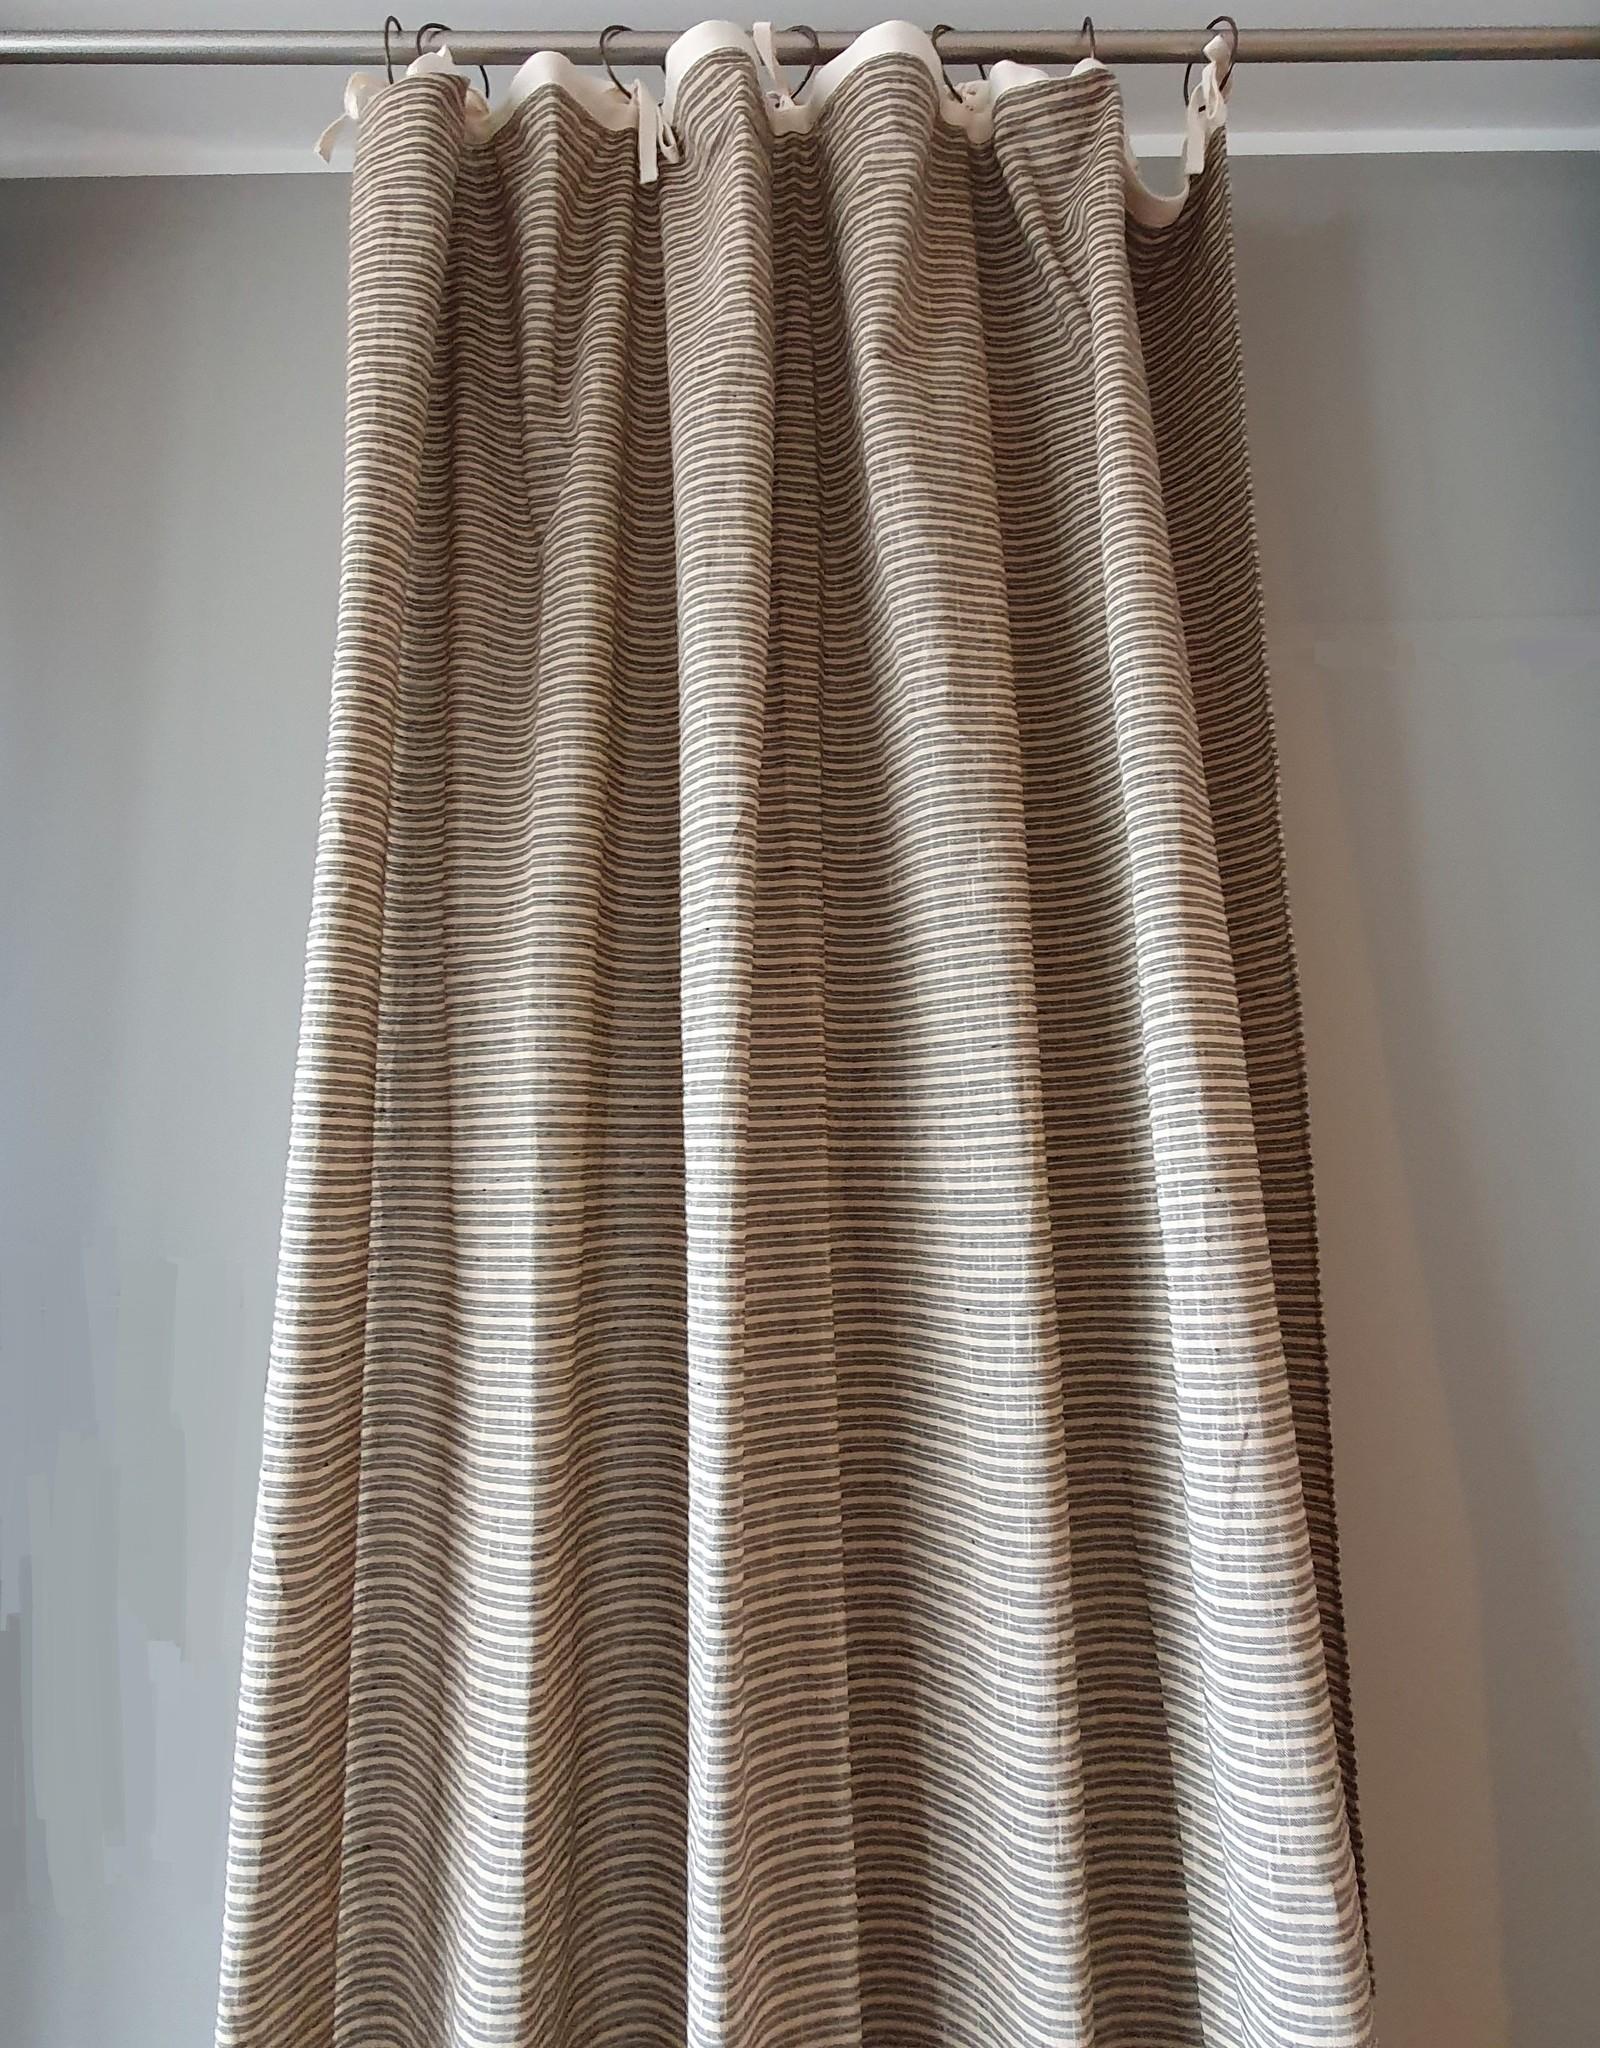 PUNJAB  curtain 135X280 cm BEIGE